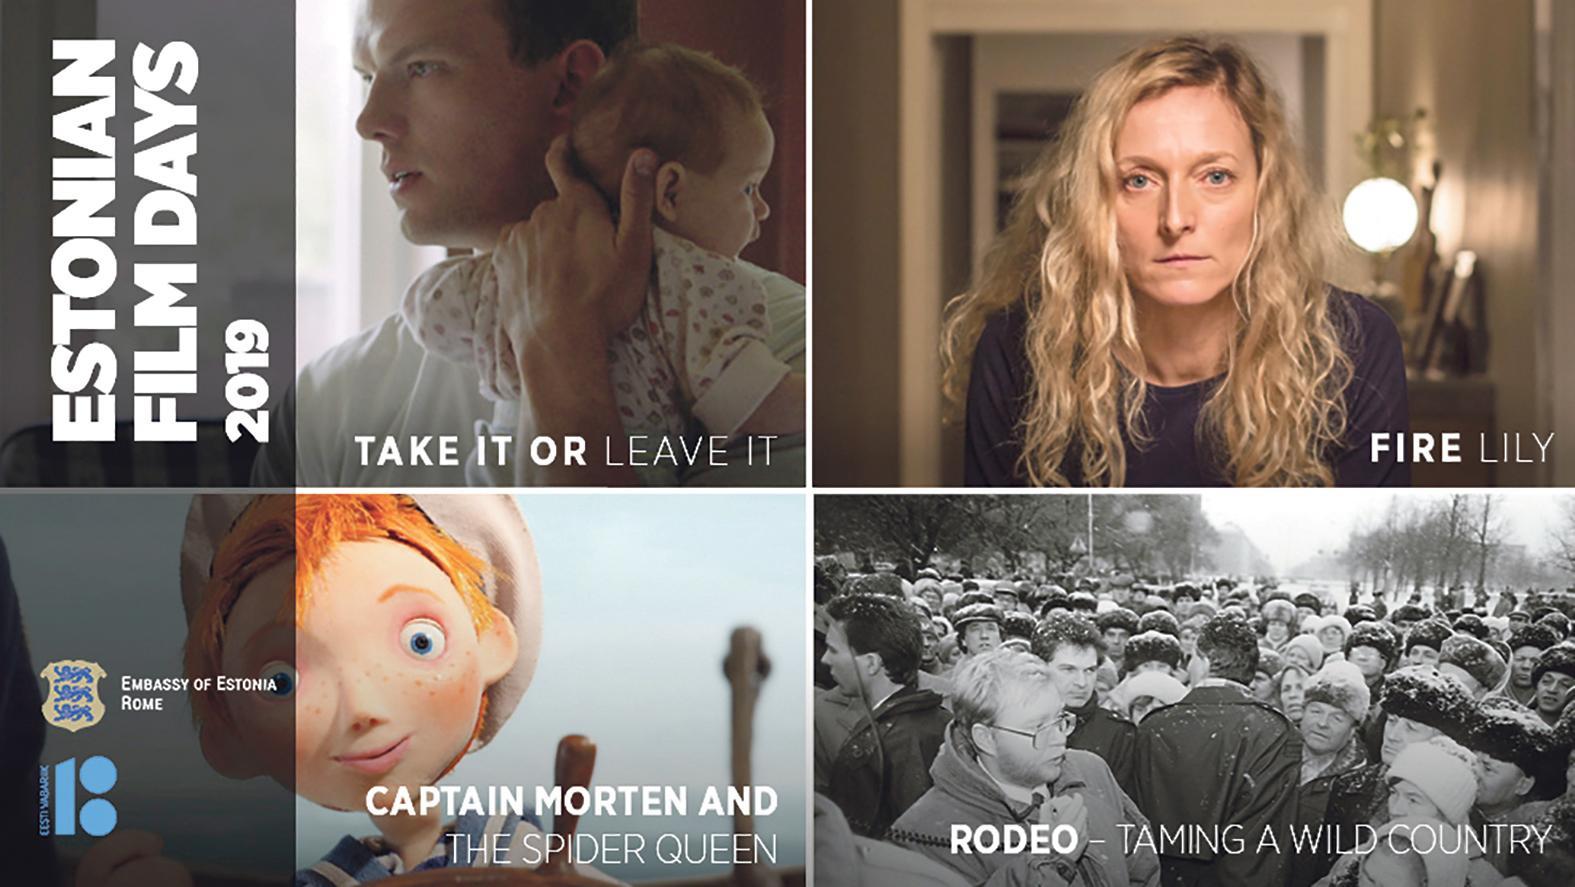 The Estonian Film Days 2019 poster.